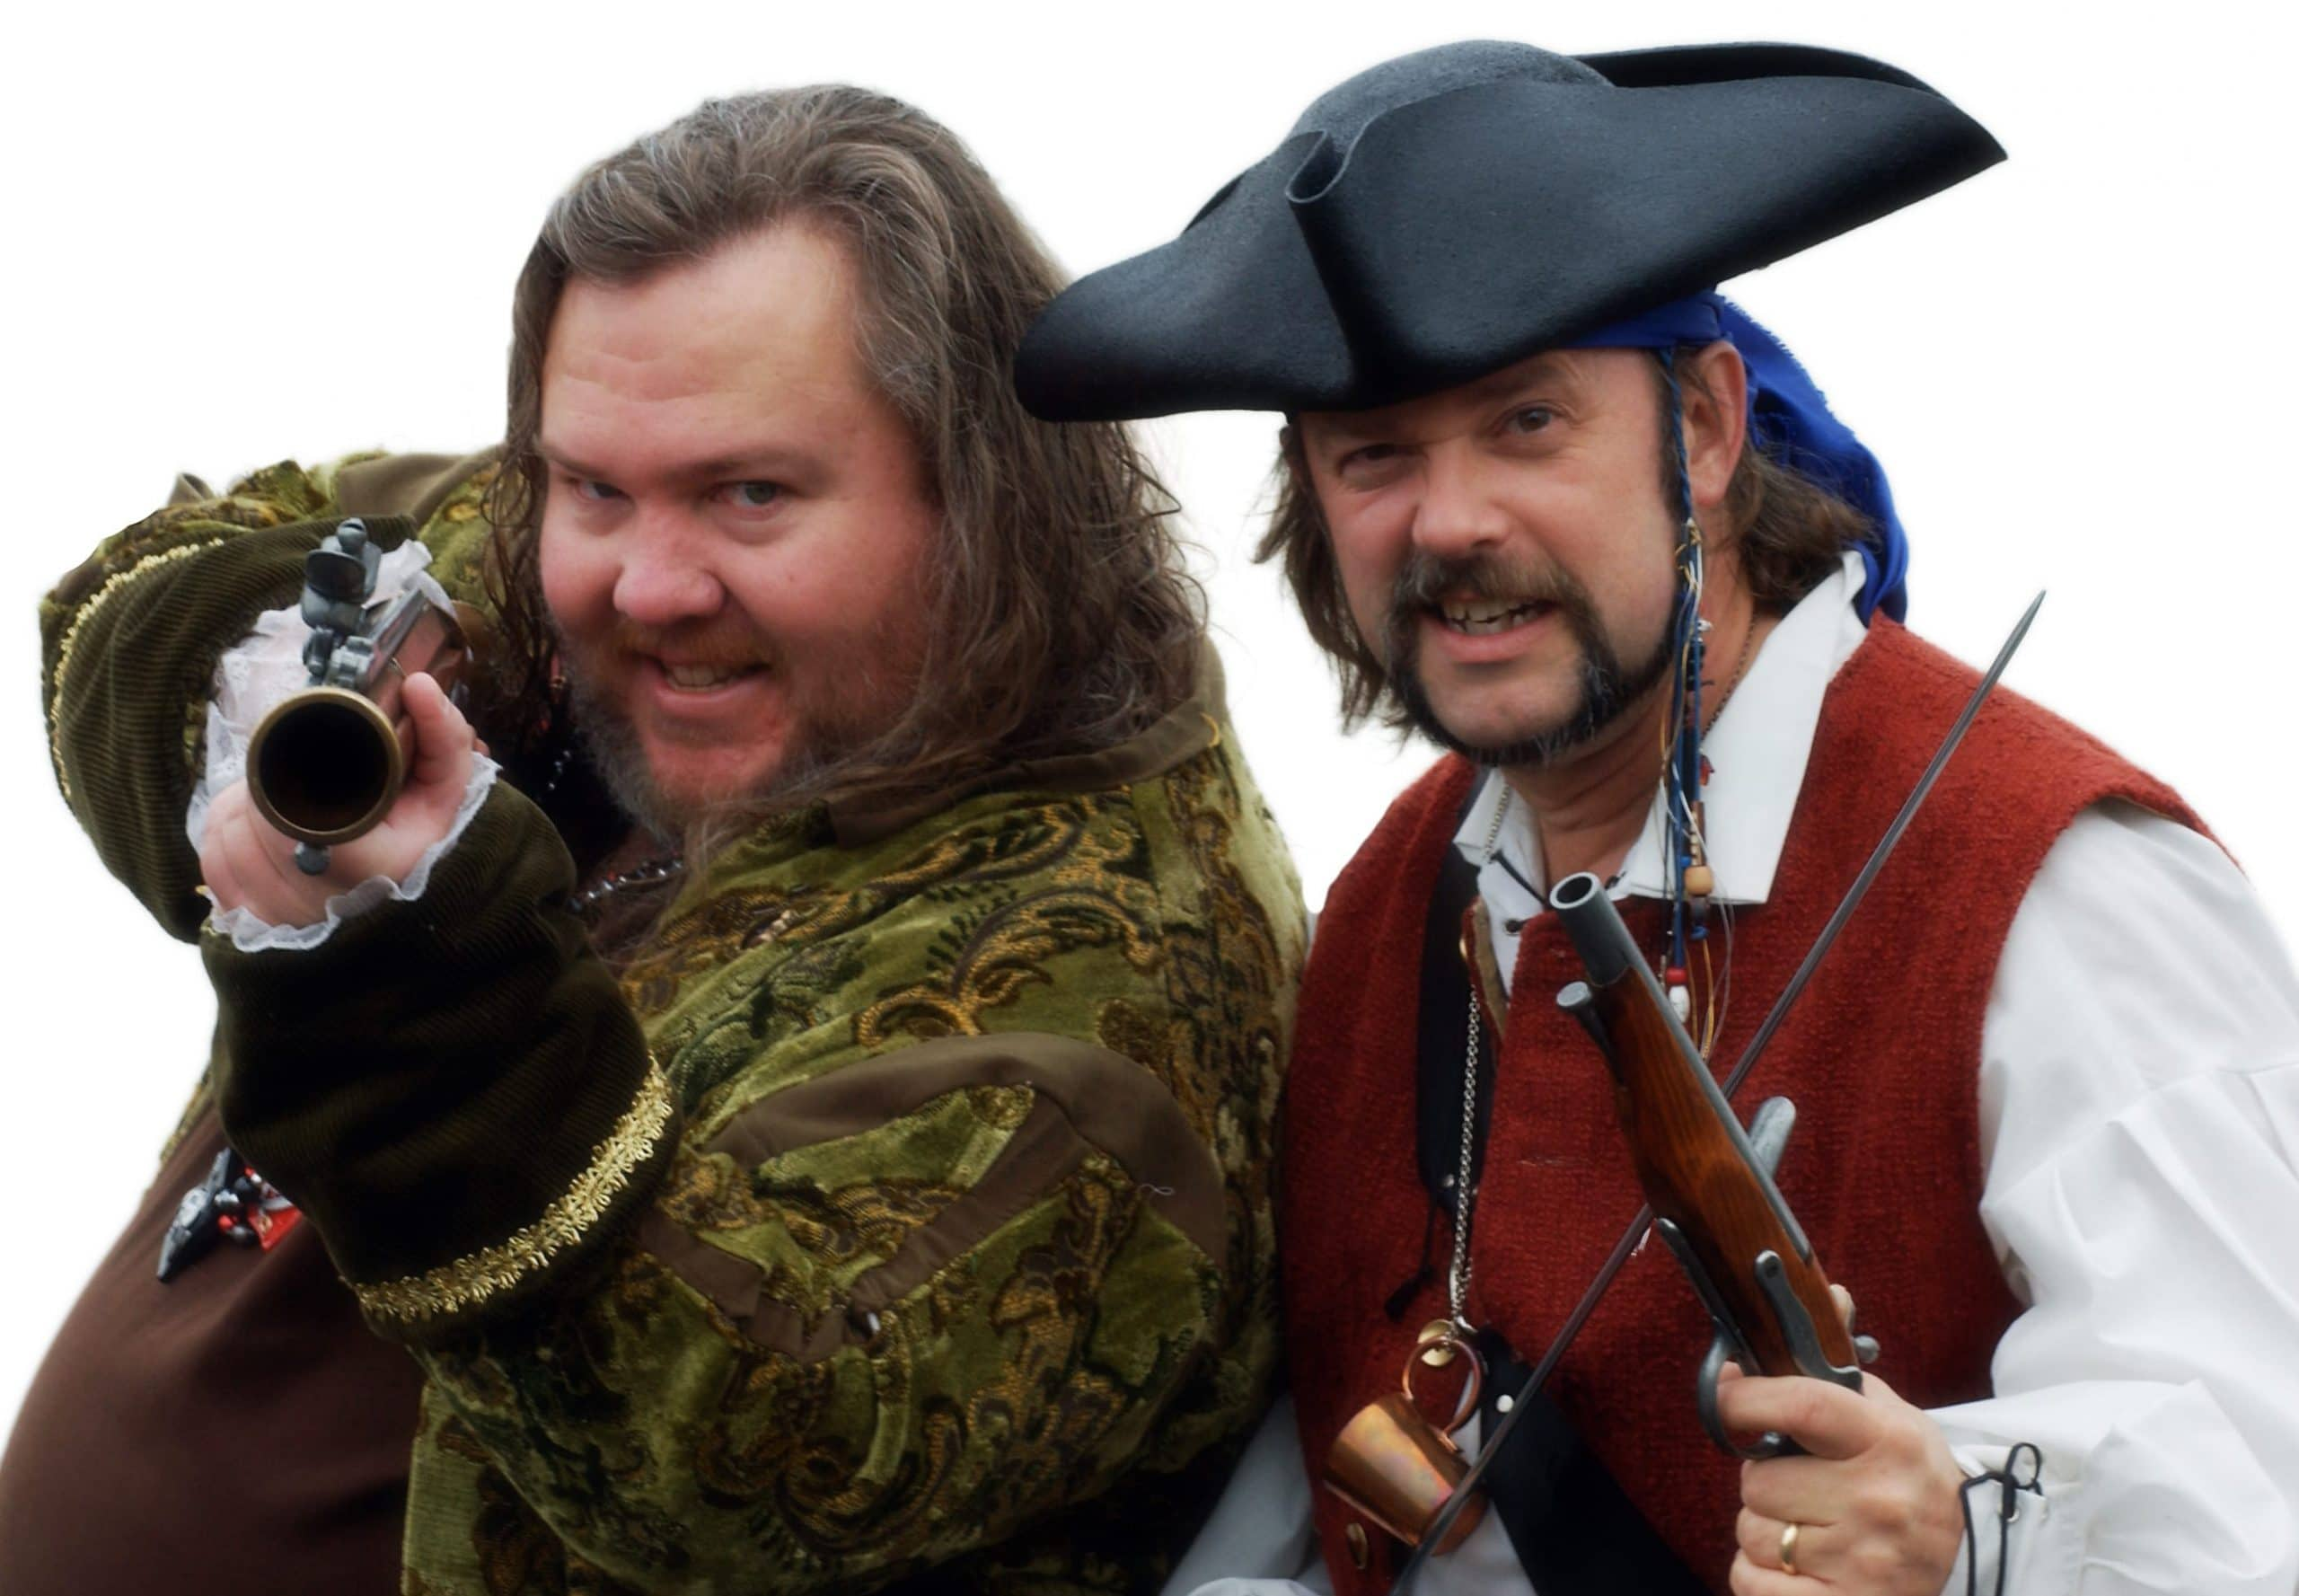 john-mark-habla-piratas